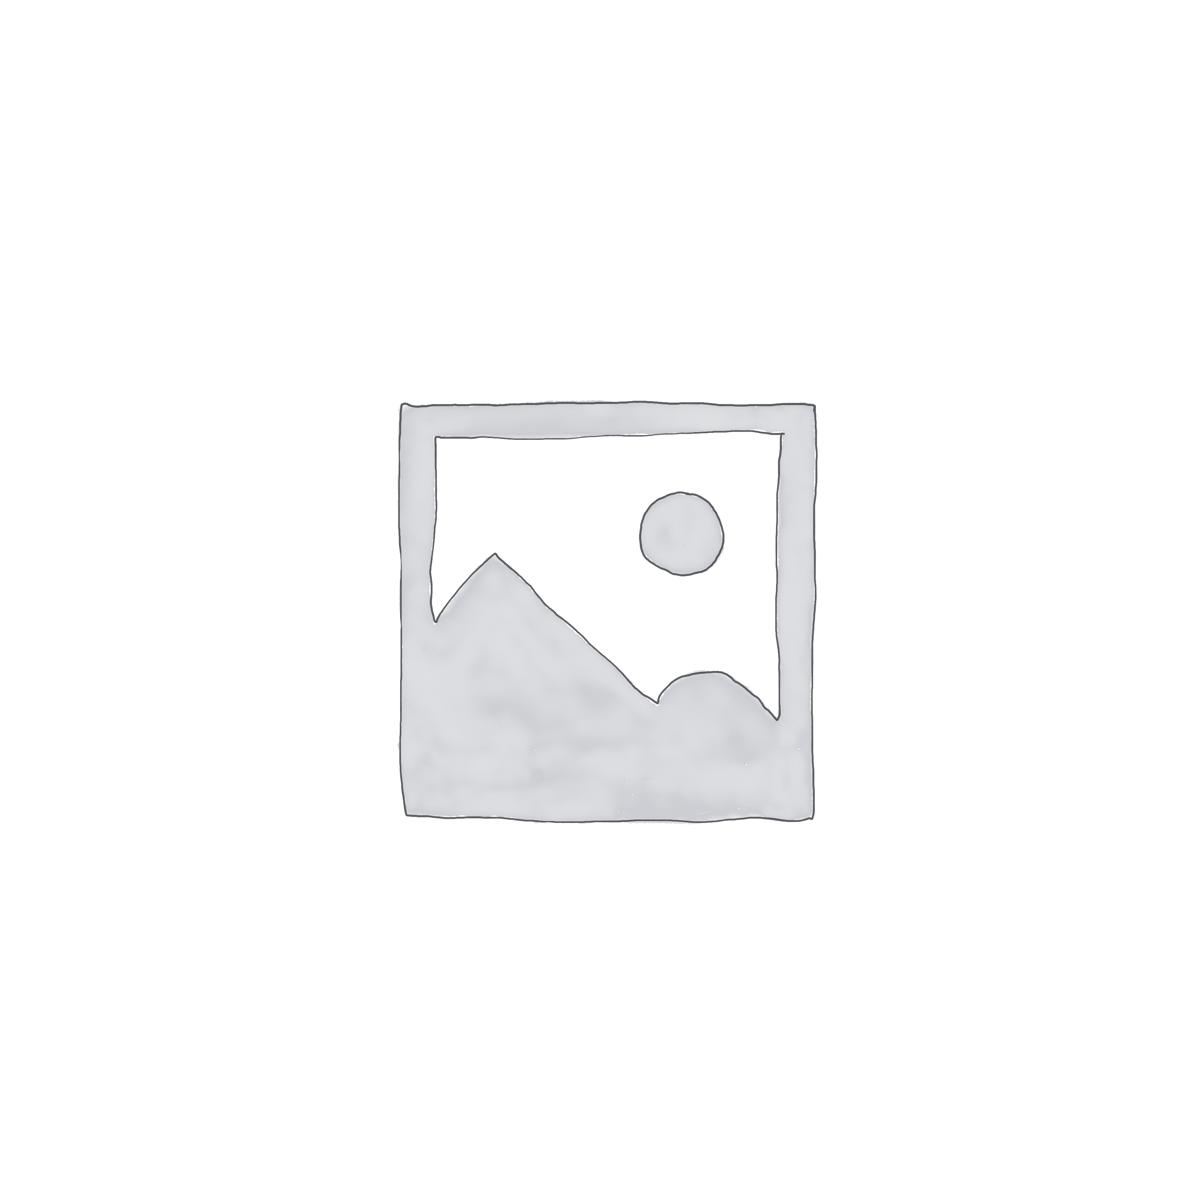 سراتو TD -(وارداتی 2010-2012)